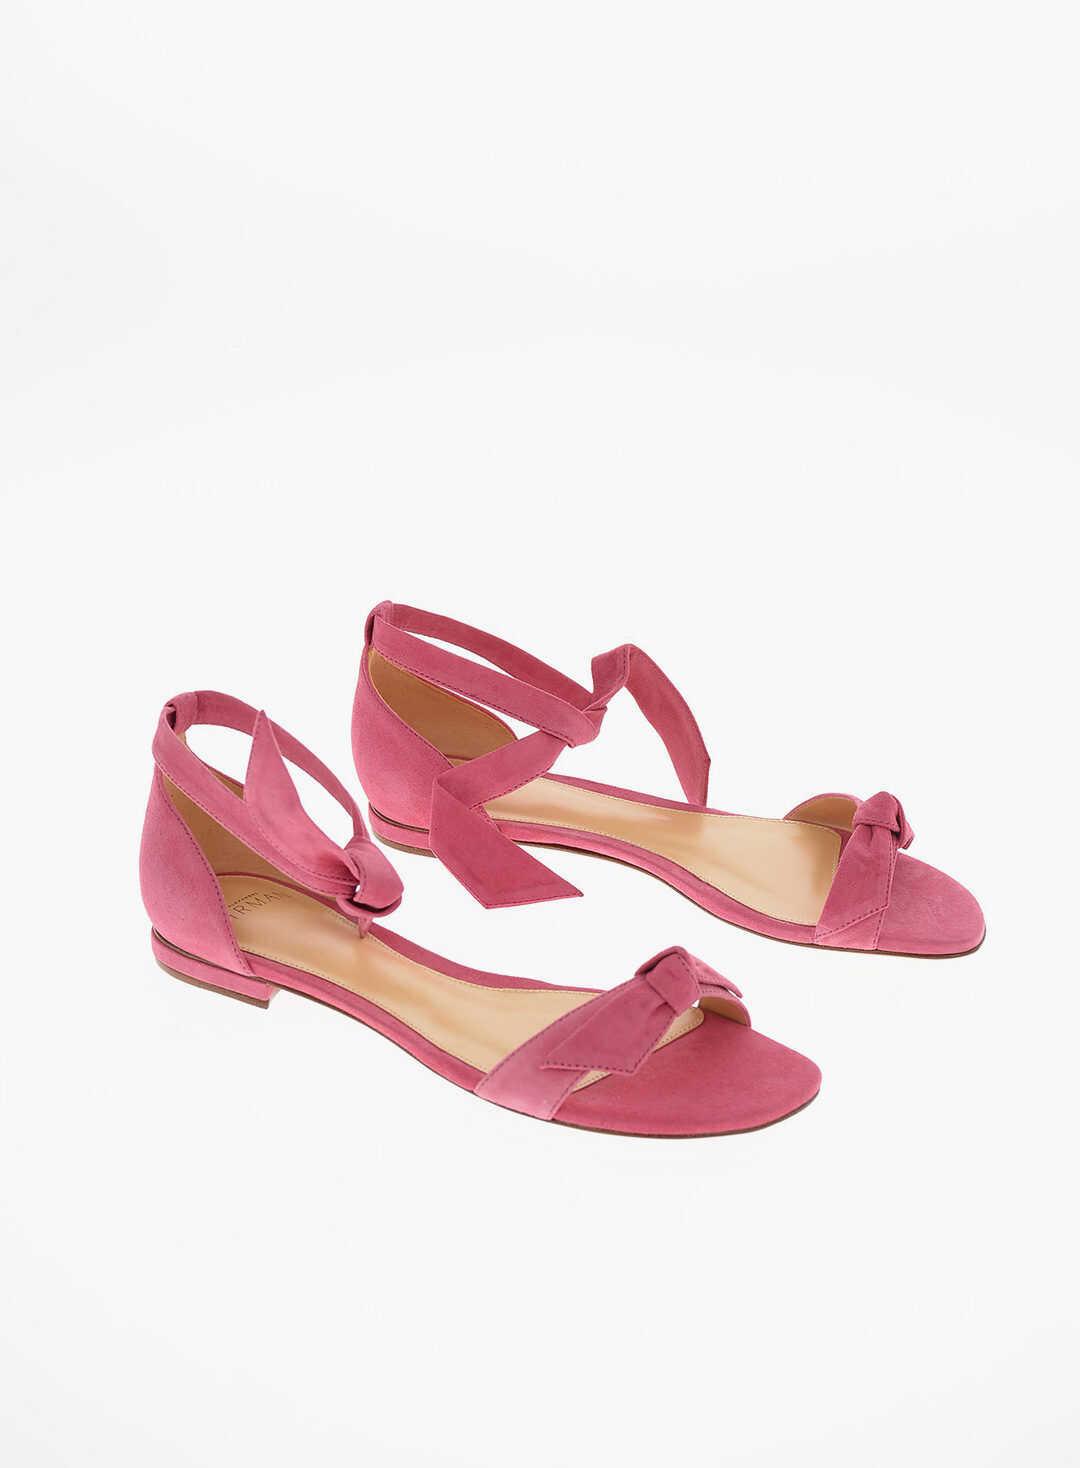 Alexandre Birman leather Suede NEW CLARITA Sandals PINK imagine b-mall.ro